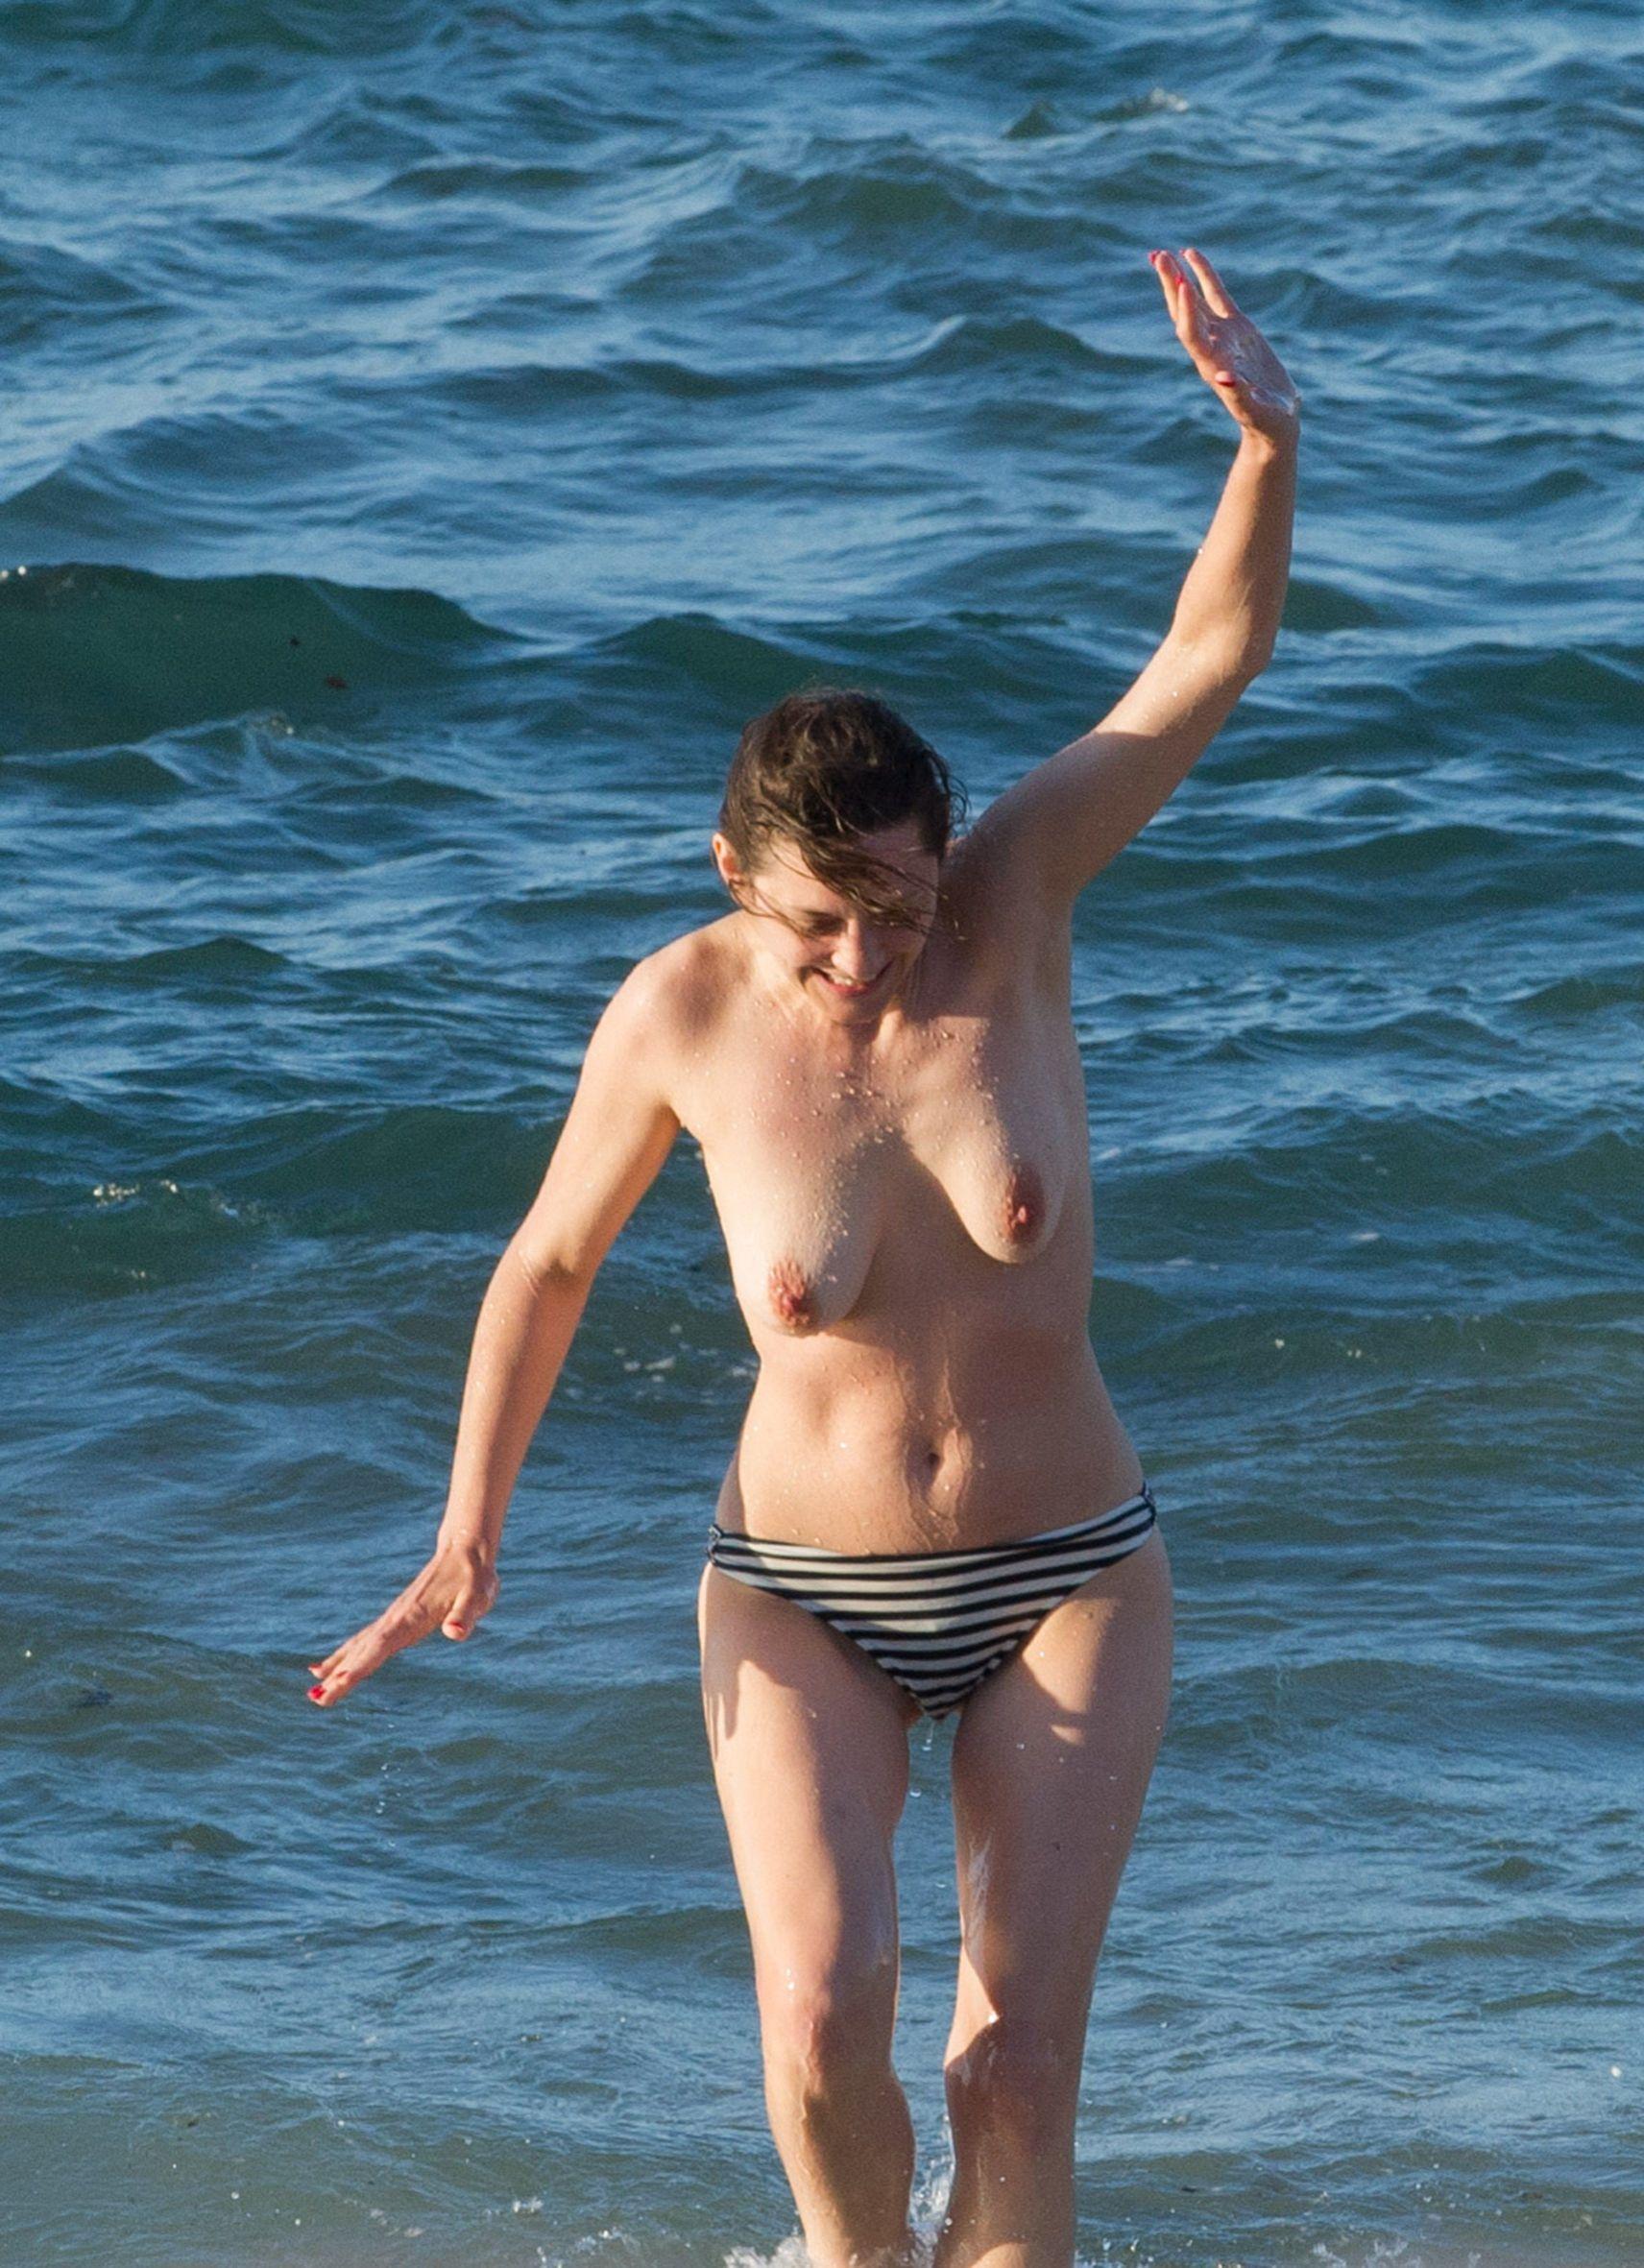 Marion cotillard naked pussy image — pic 9